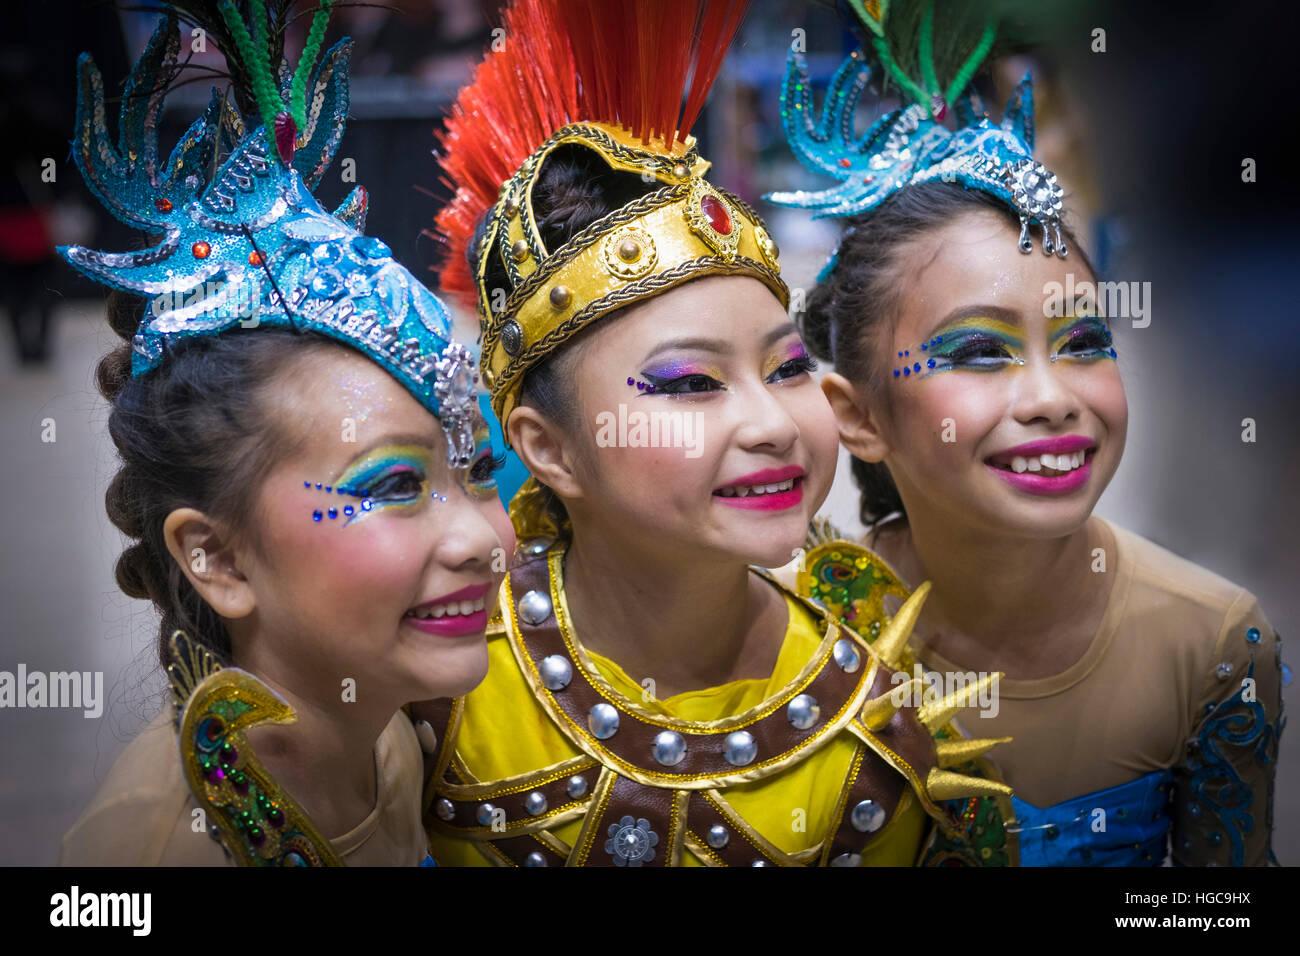 Hmong American New Year celebrations, celebrating Hmong ...